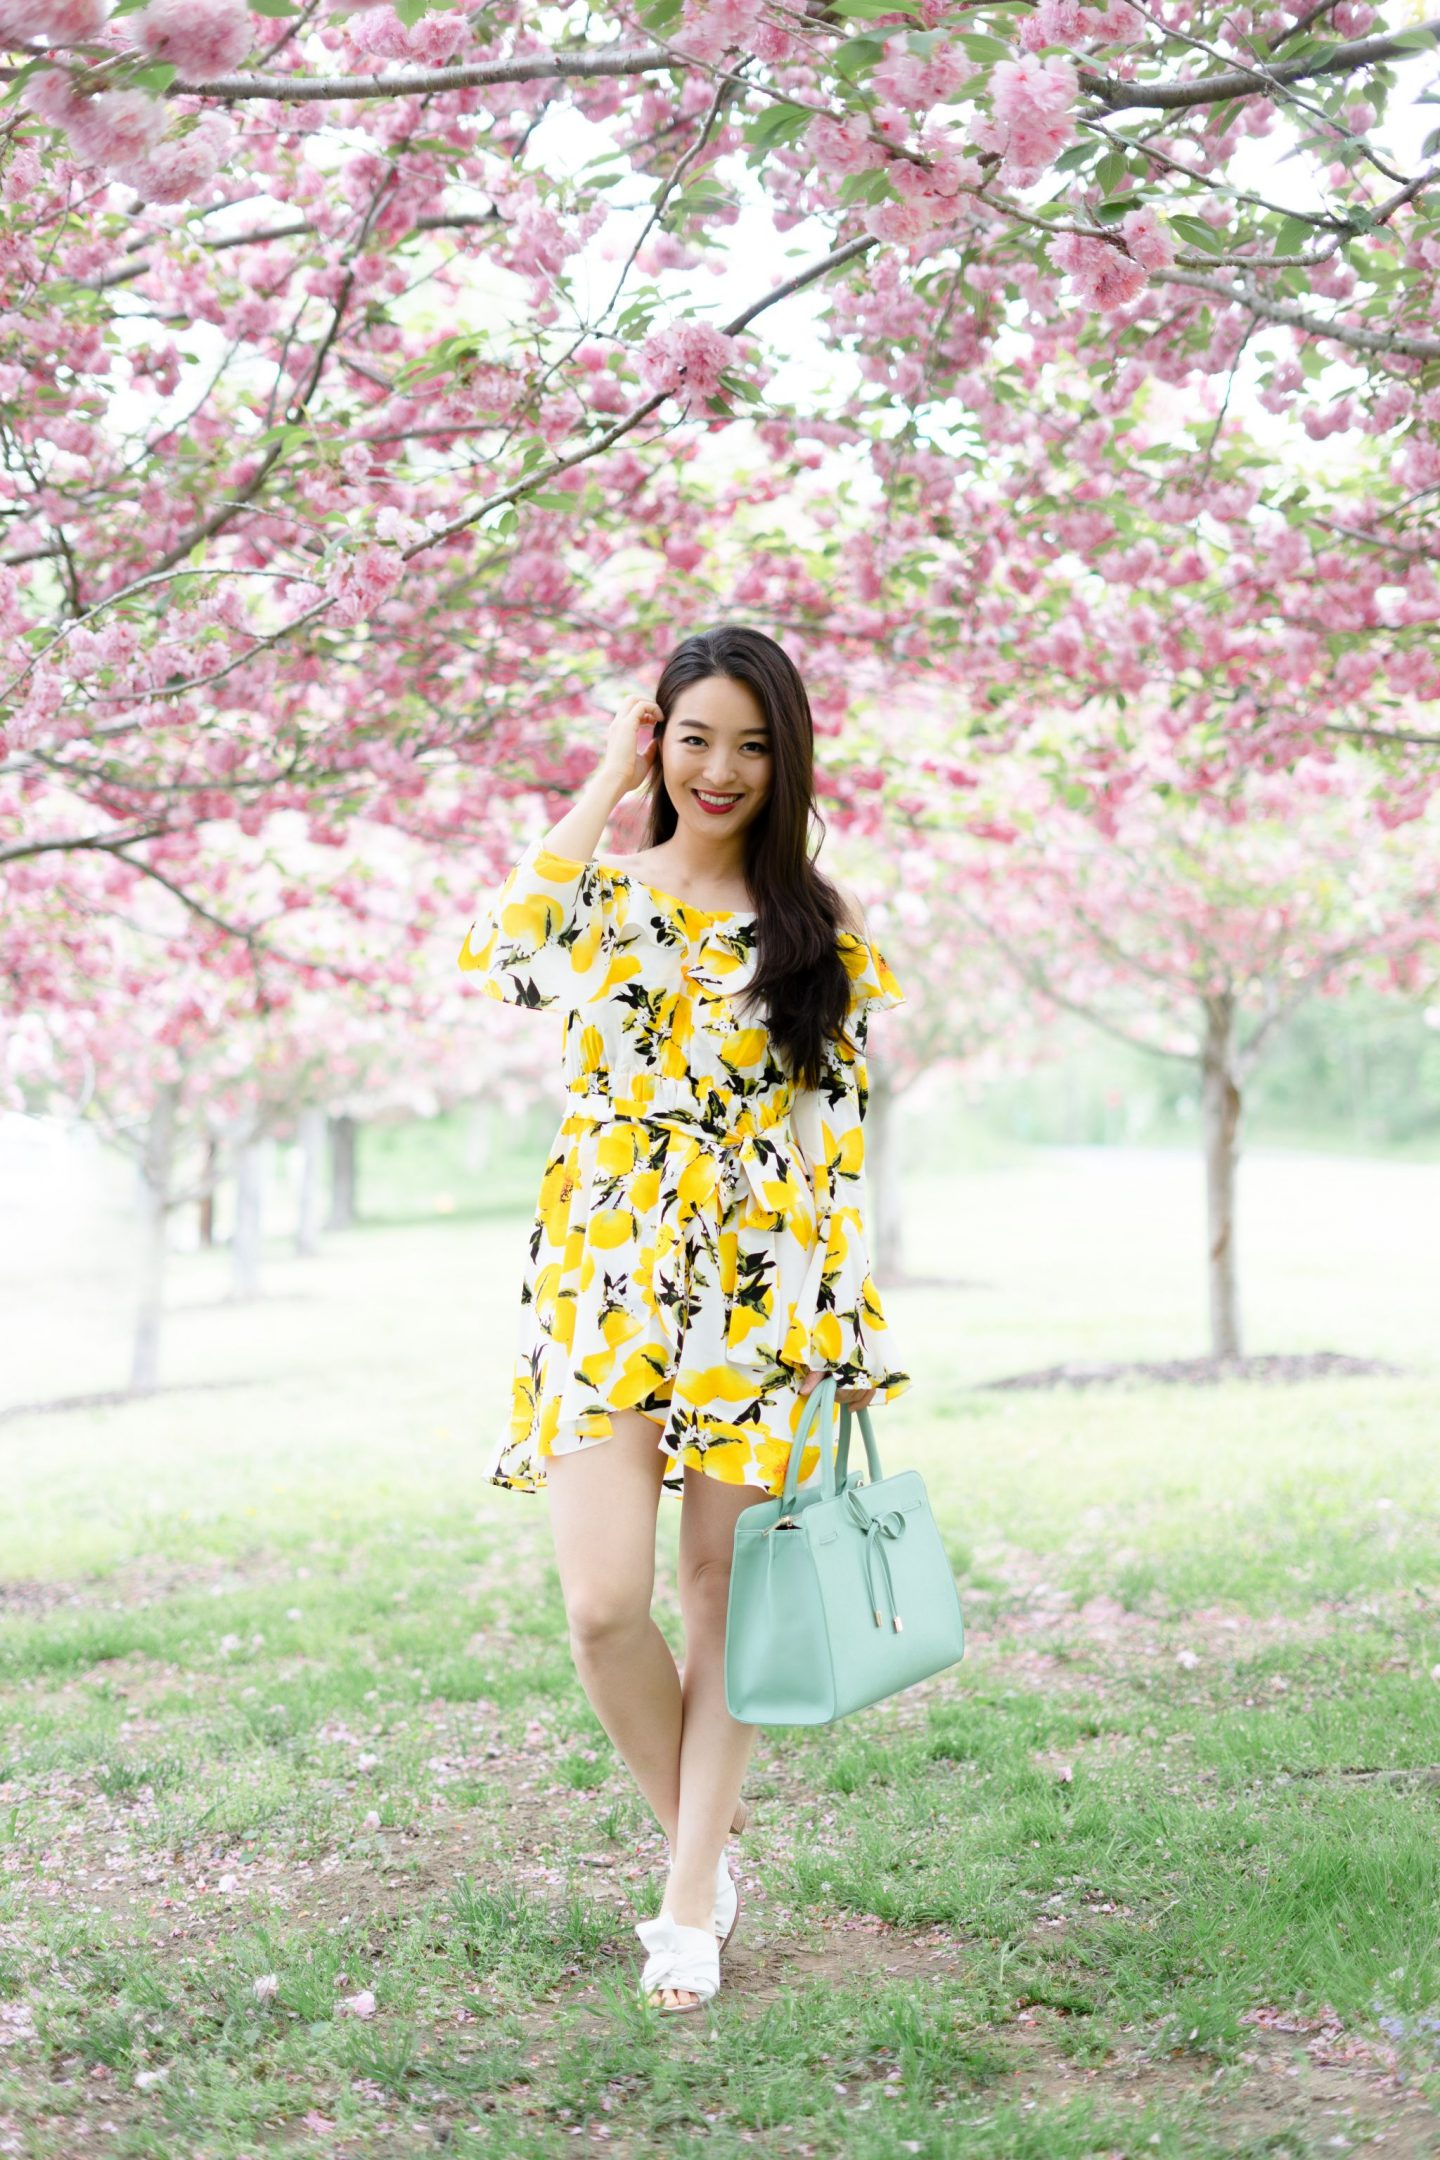 fashion blogger posing under flowers